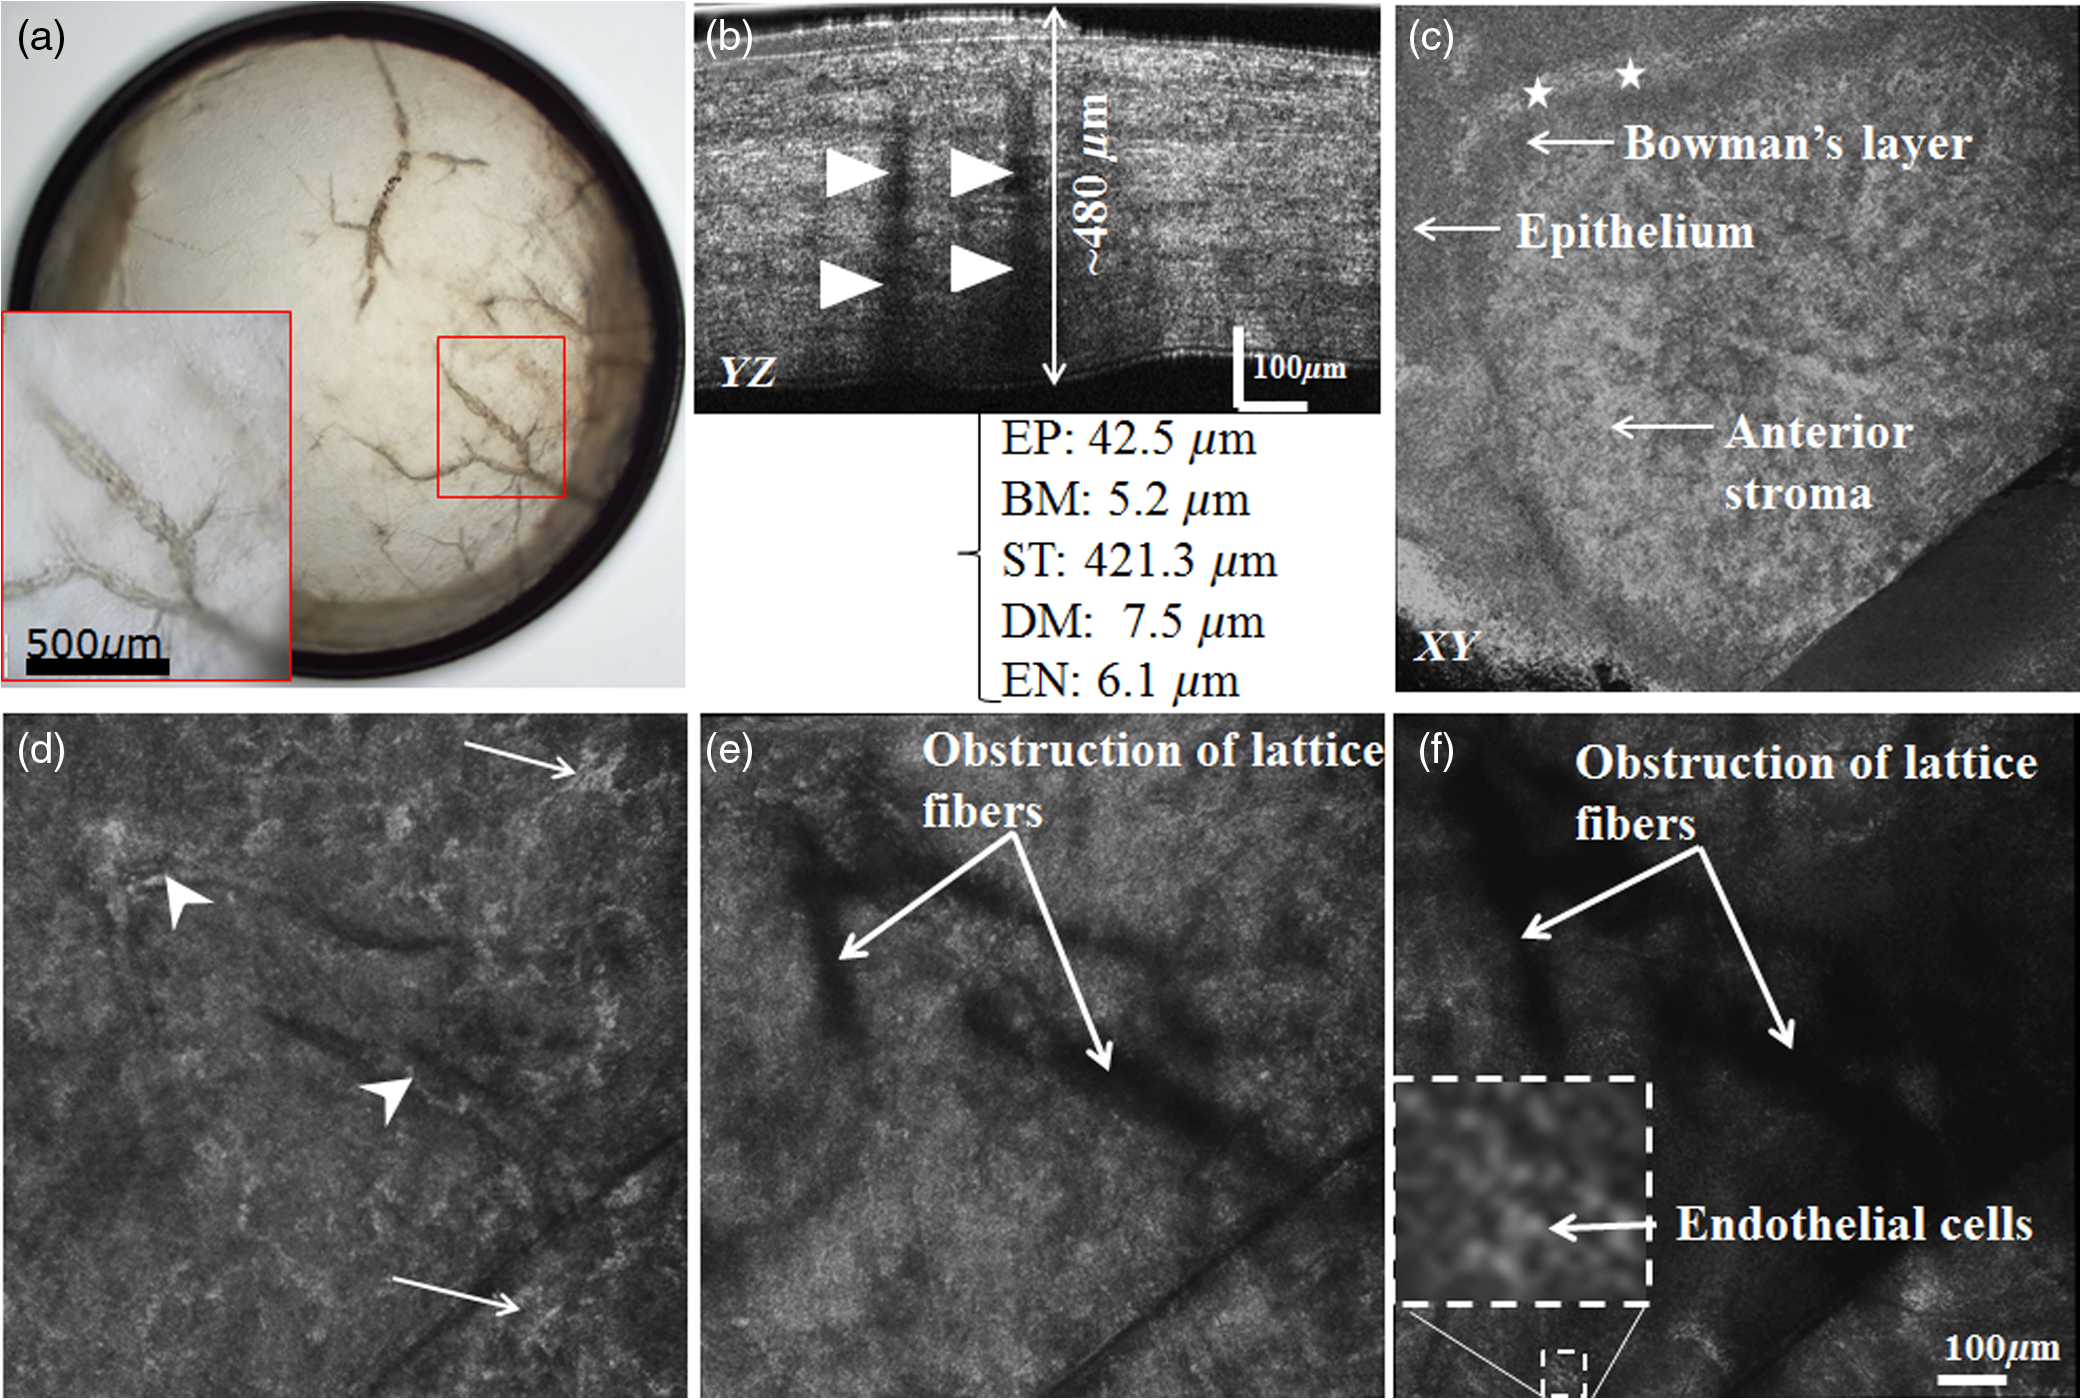 Capabilities of Gabor-domain optical coherence microscopy